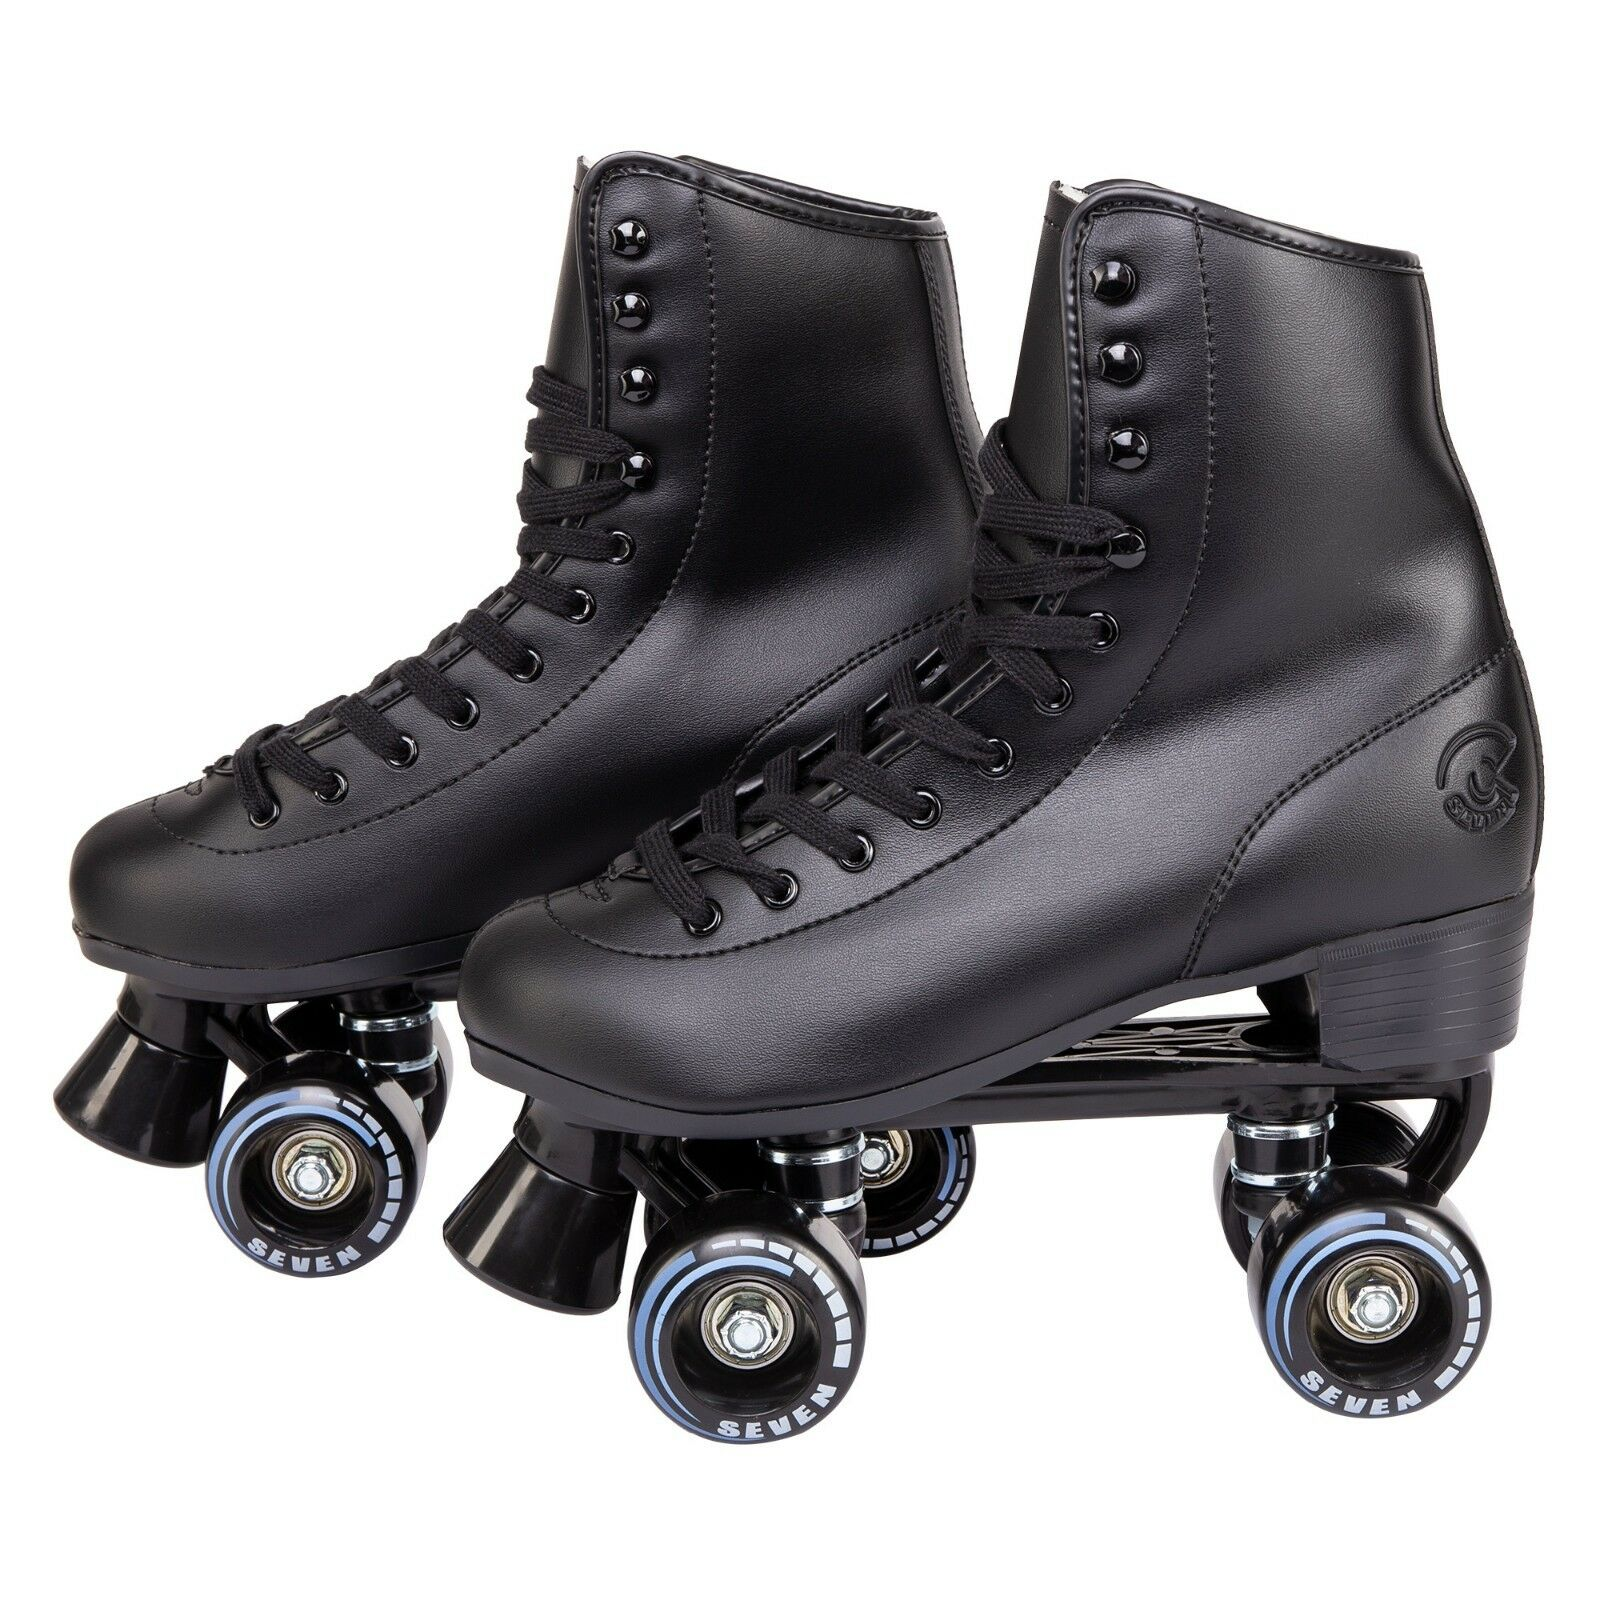 C7skates Soft Faux Leather Indoor Roller Skates Classic Ebon